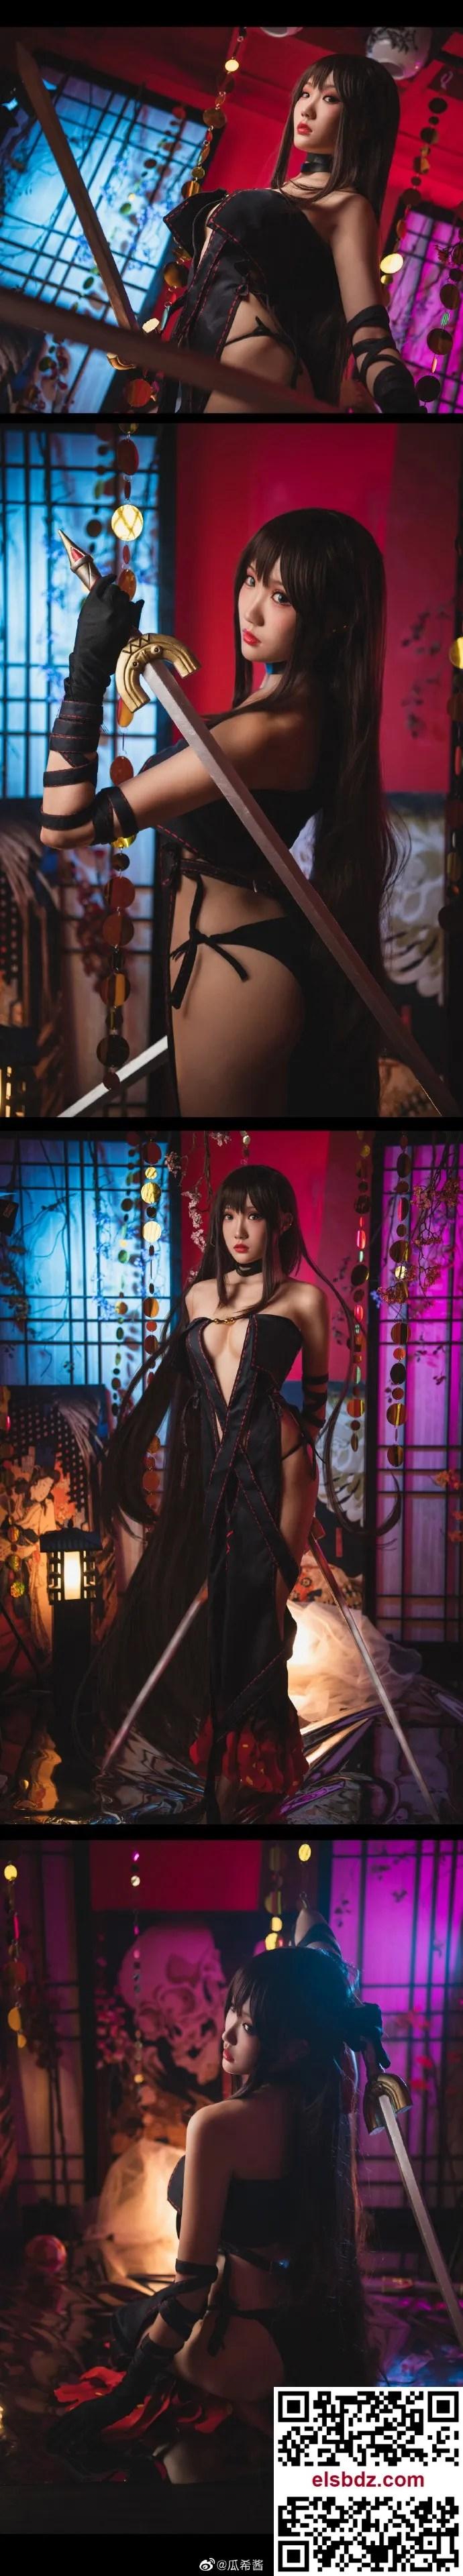 Fate/GrandOrder虞姬 命运冠位指定 虞美人cos CN瓜希酱 (9P)插图(7)